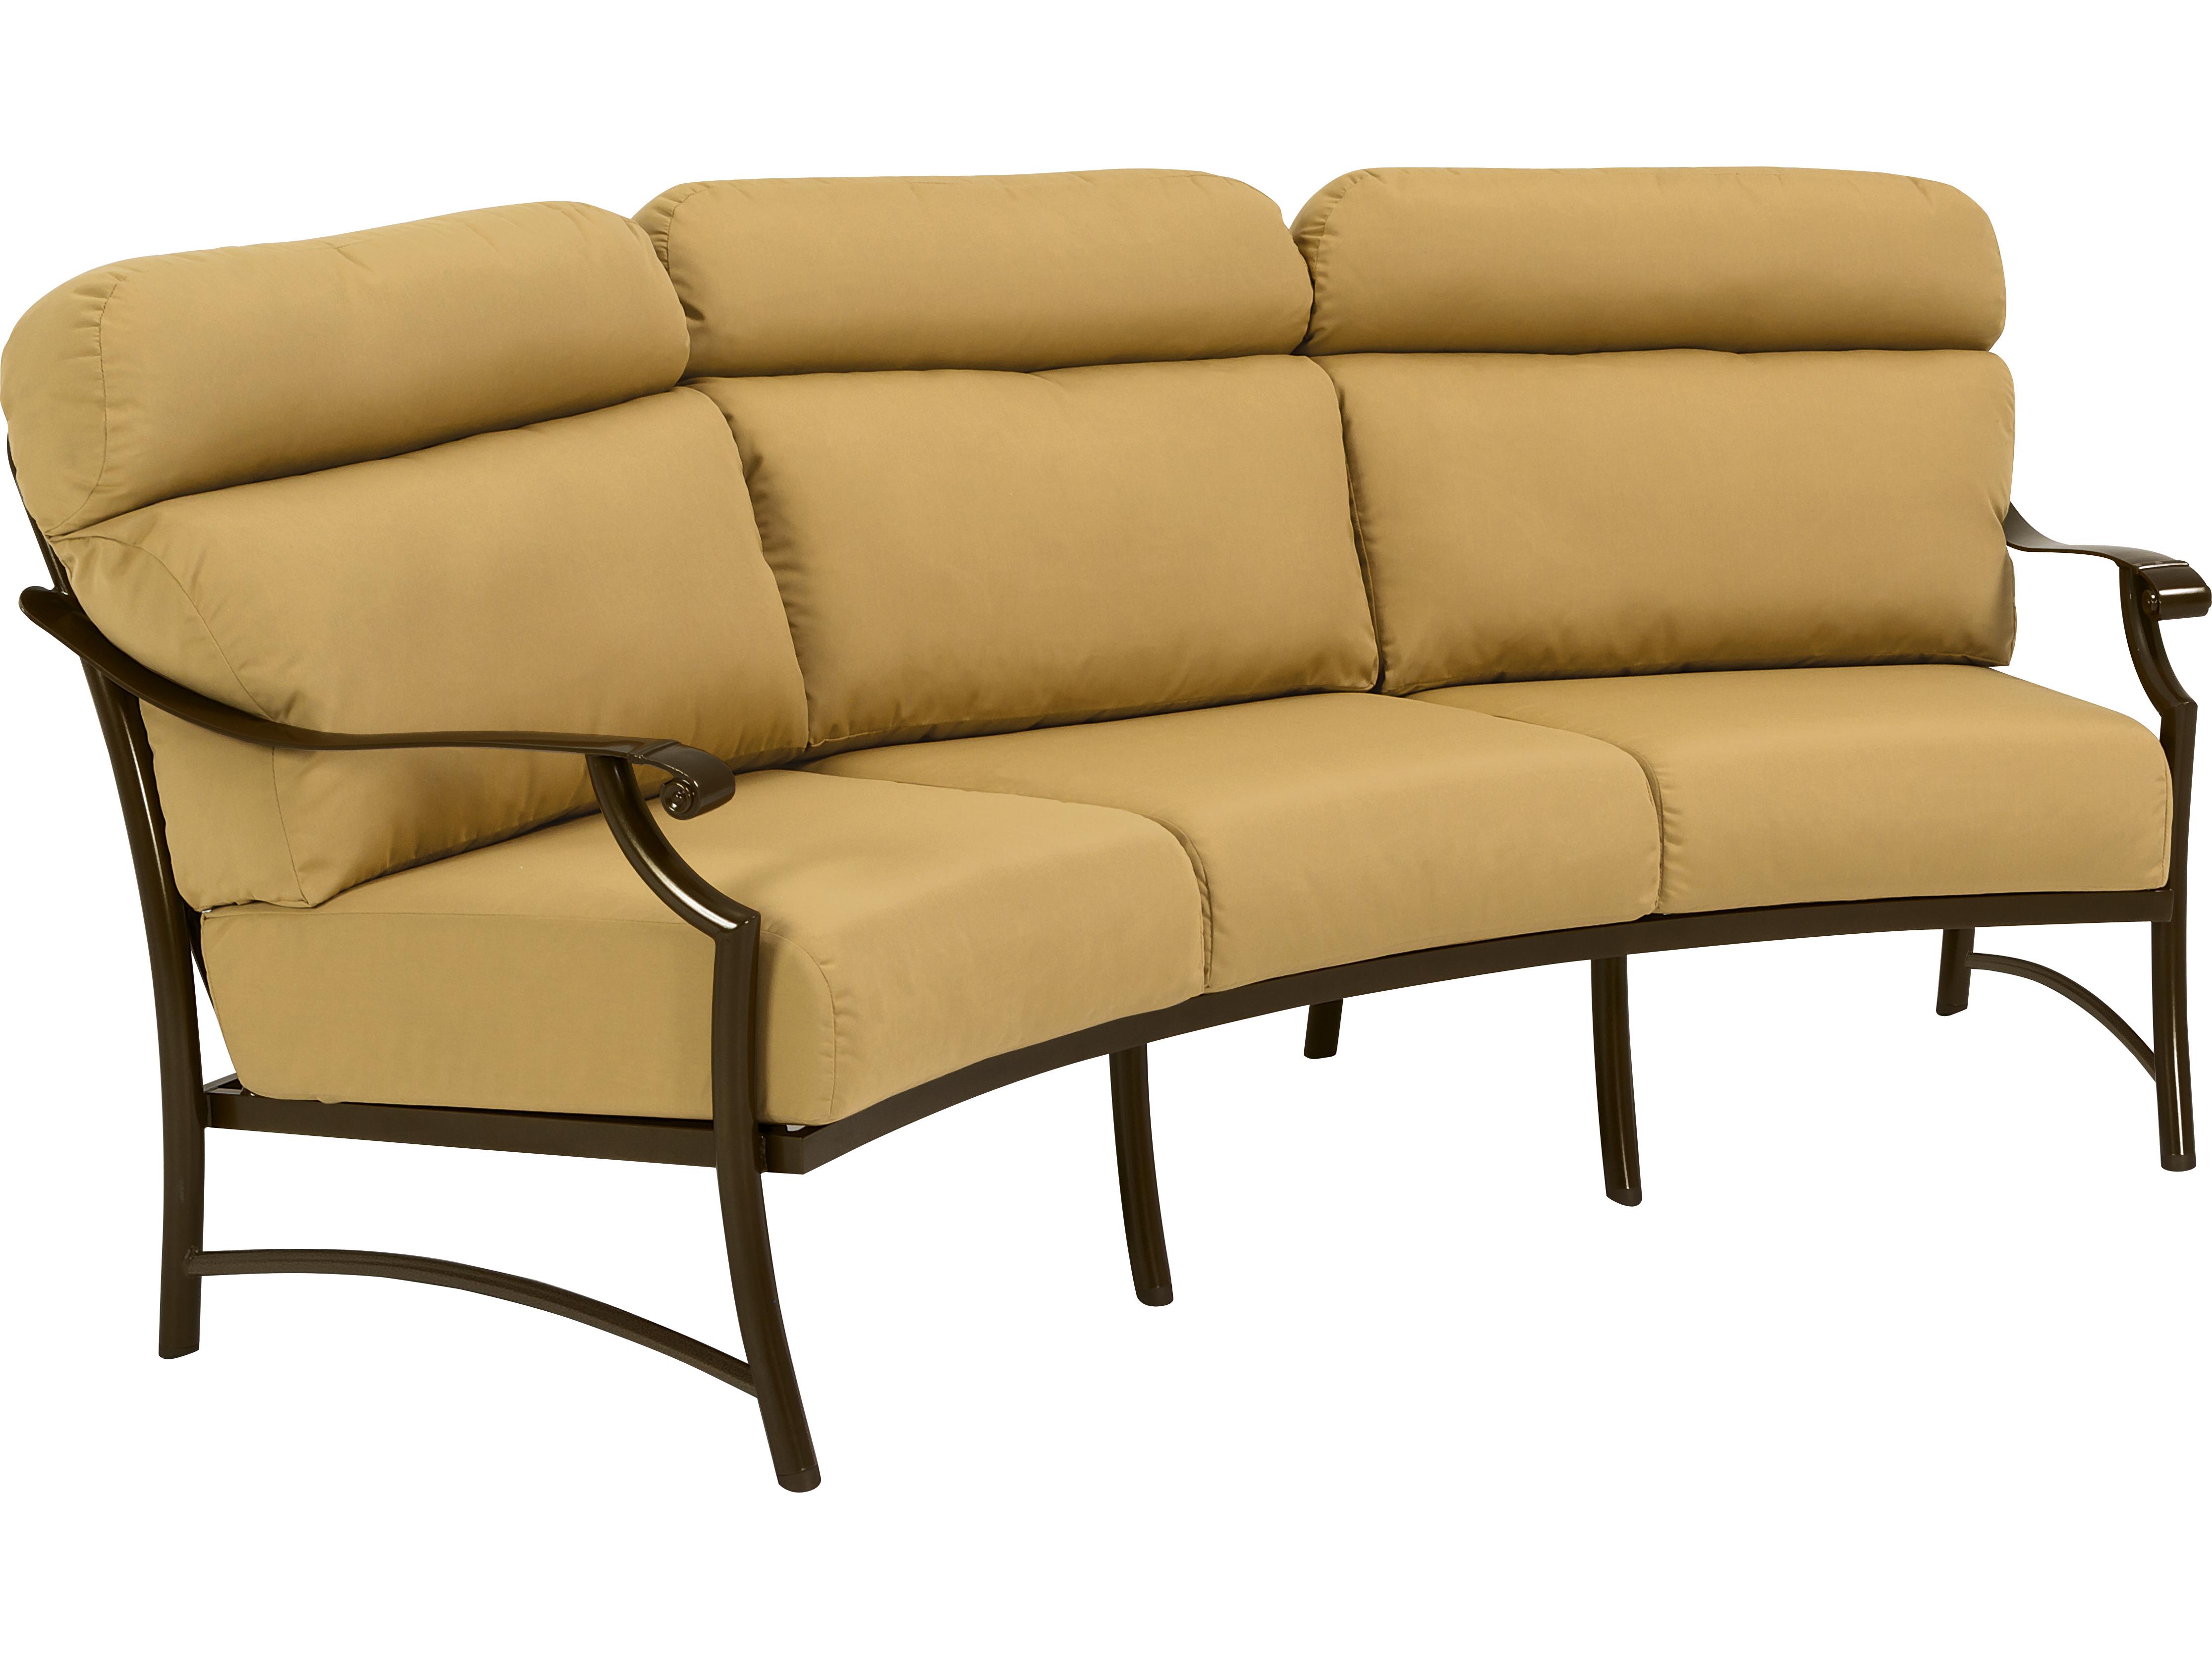 Tropitone Montreux Cushion Aluminum Crescent Sofa